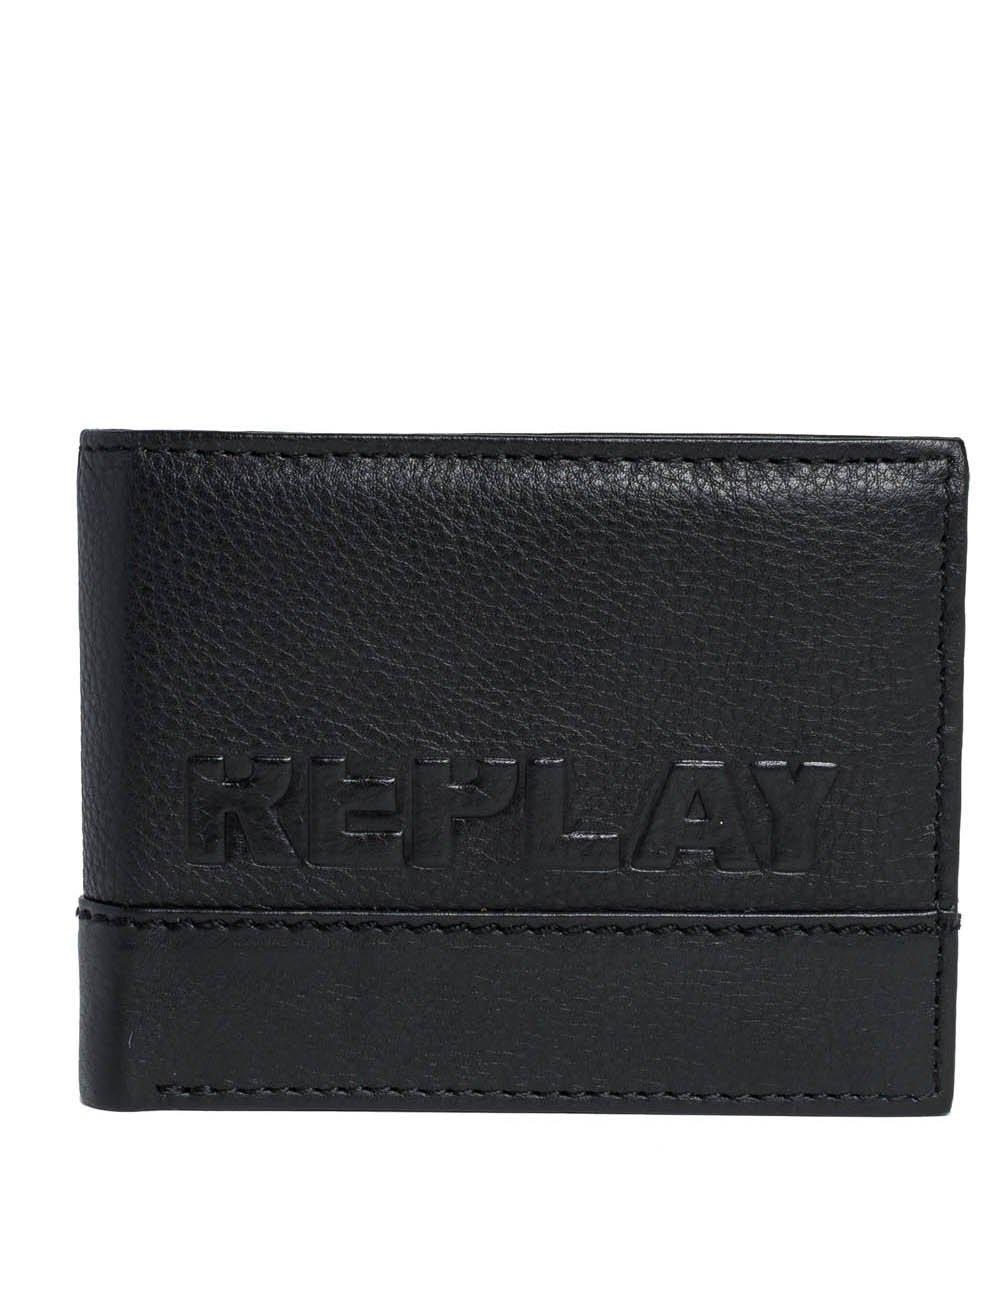 Replay Men's Leather Black Wallet